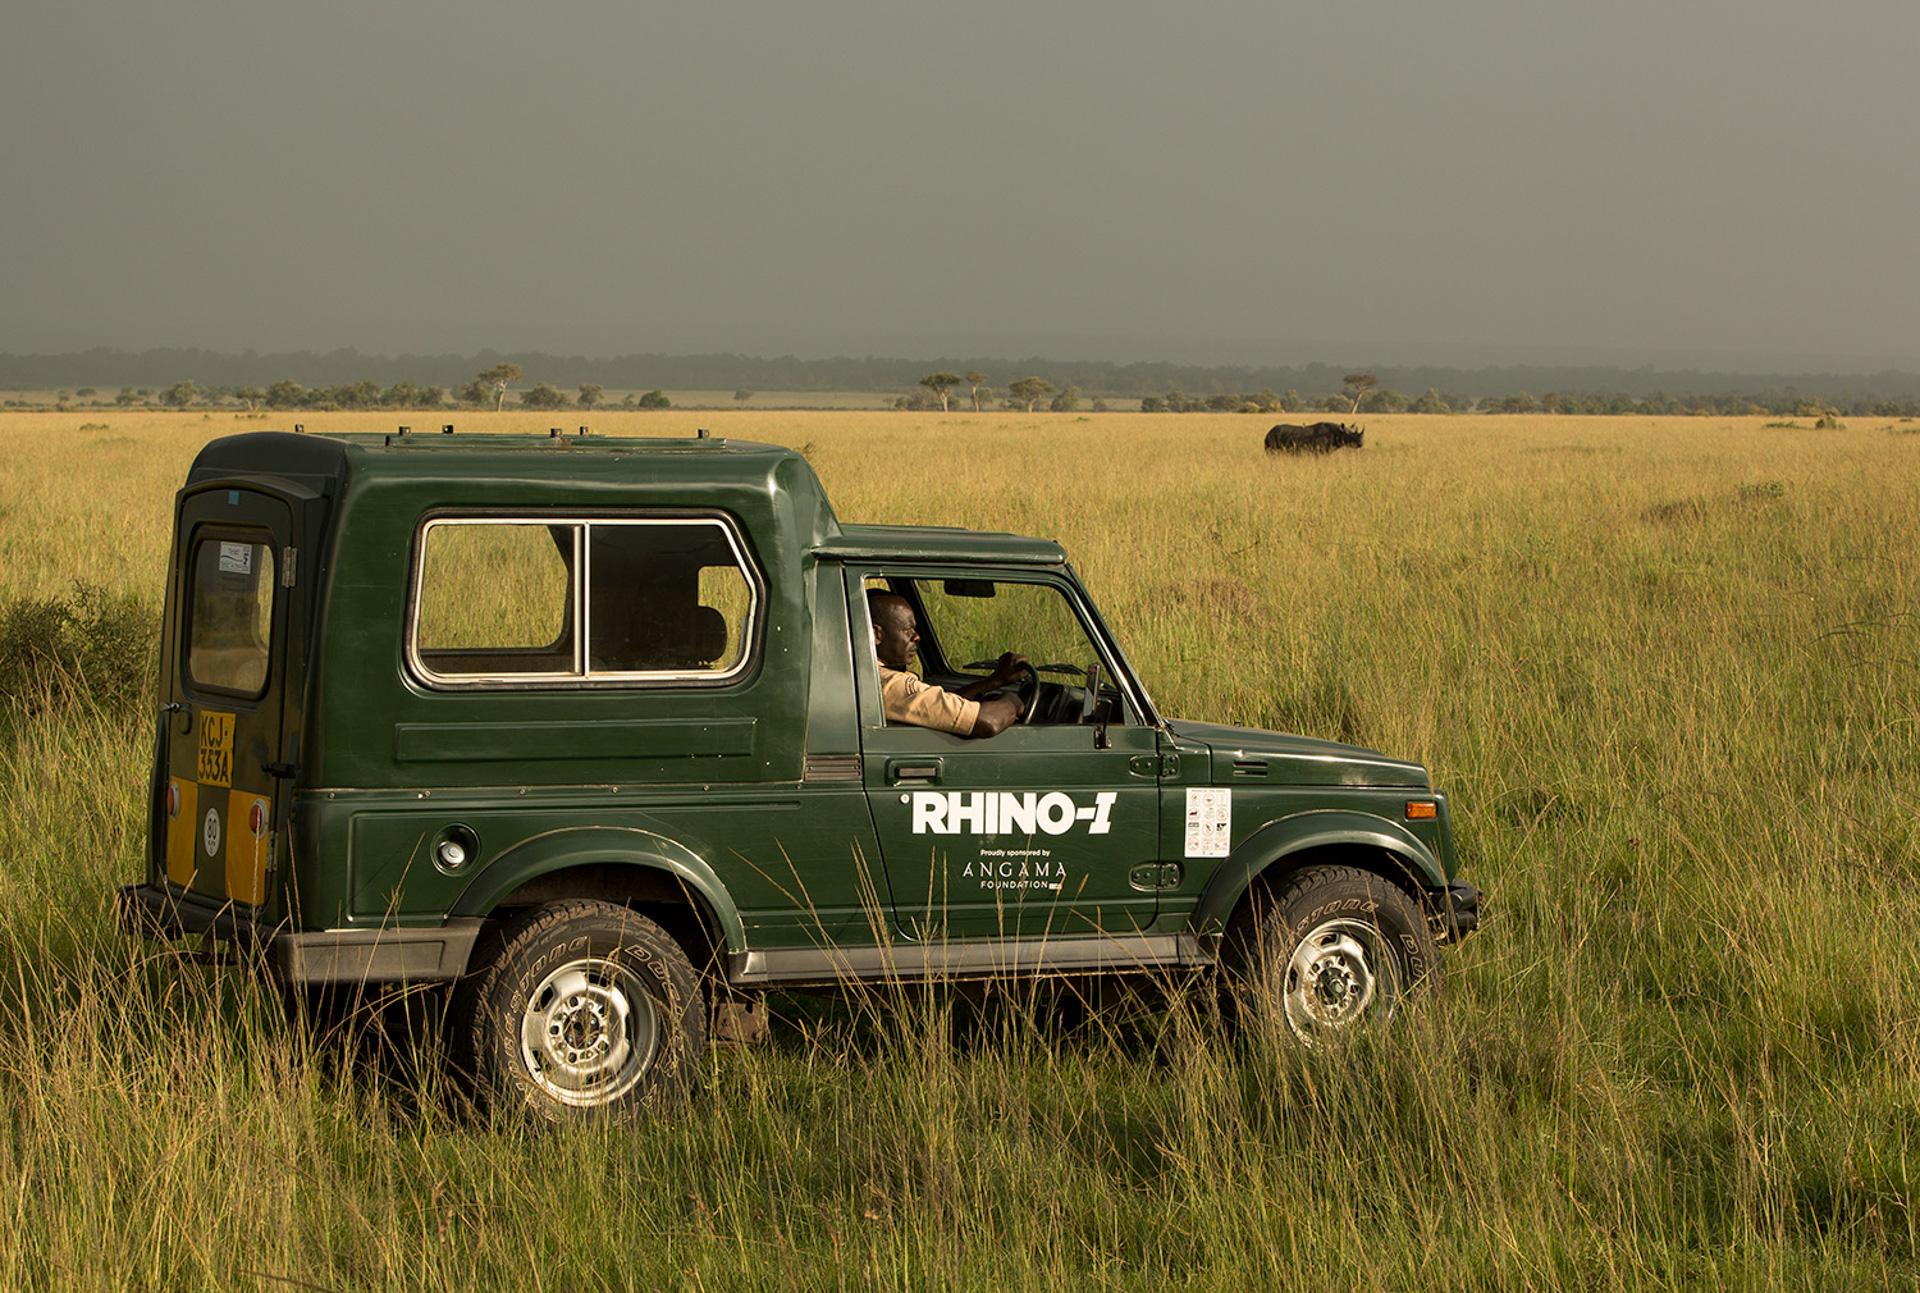 Anti rhino poaching vehicle